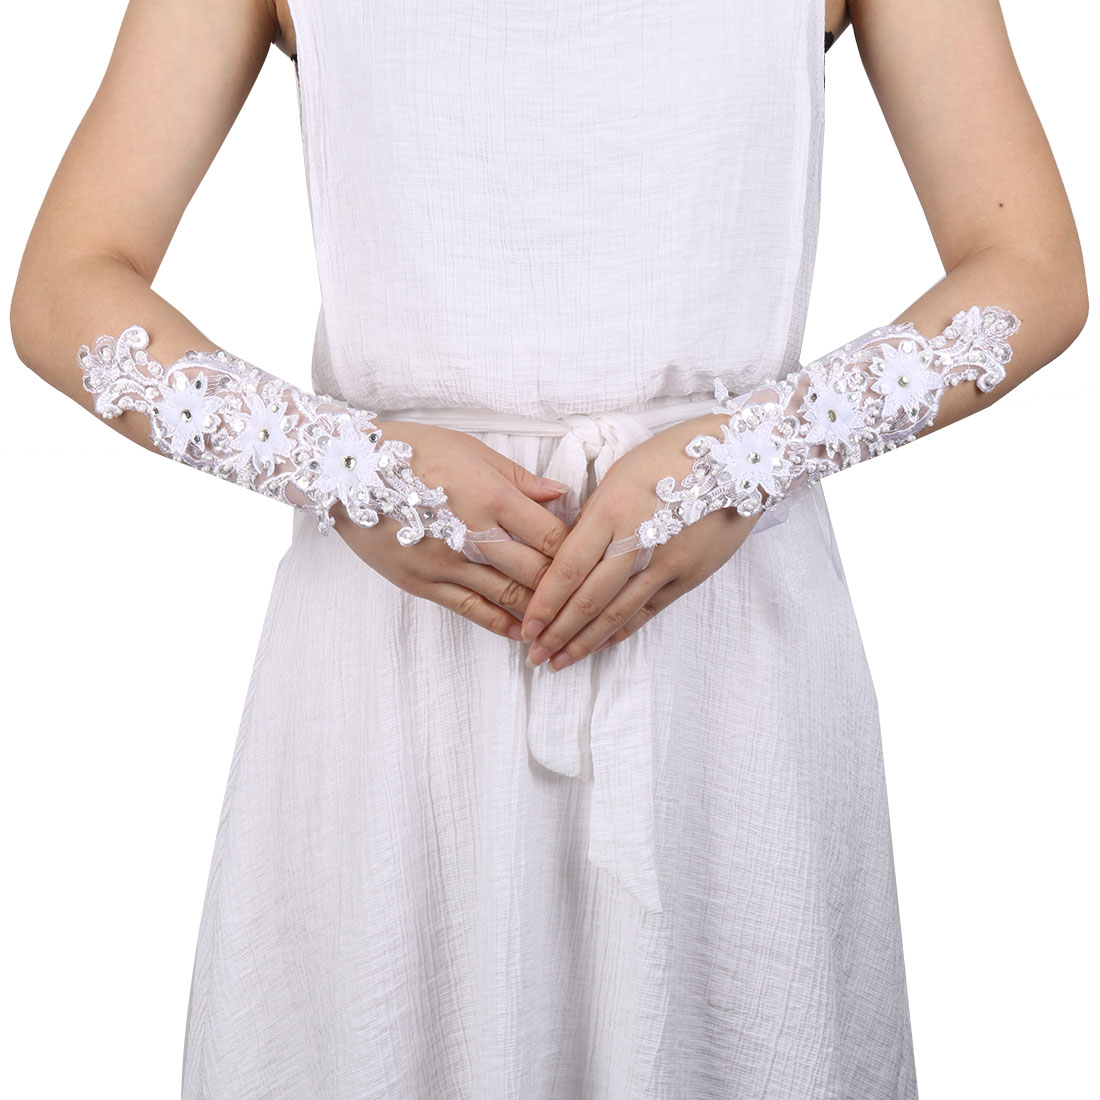 Wedding Polyester Flower Decor Bride Hand Decoration Lace Fingerless Glove Pair